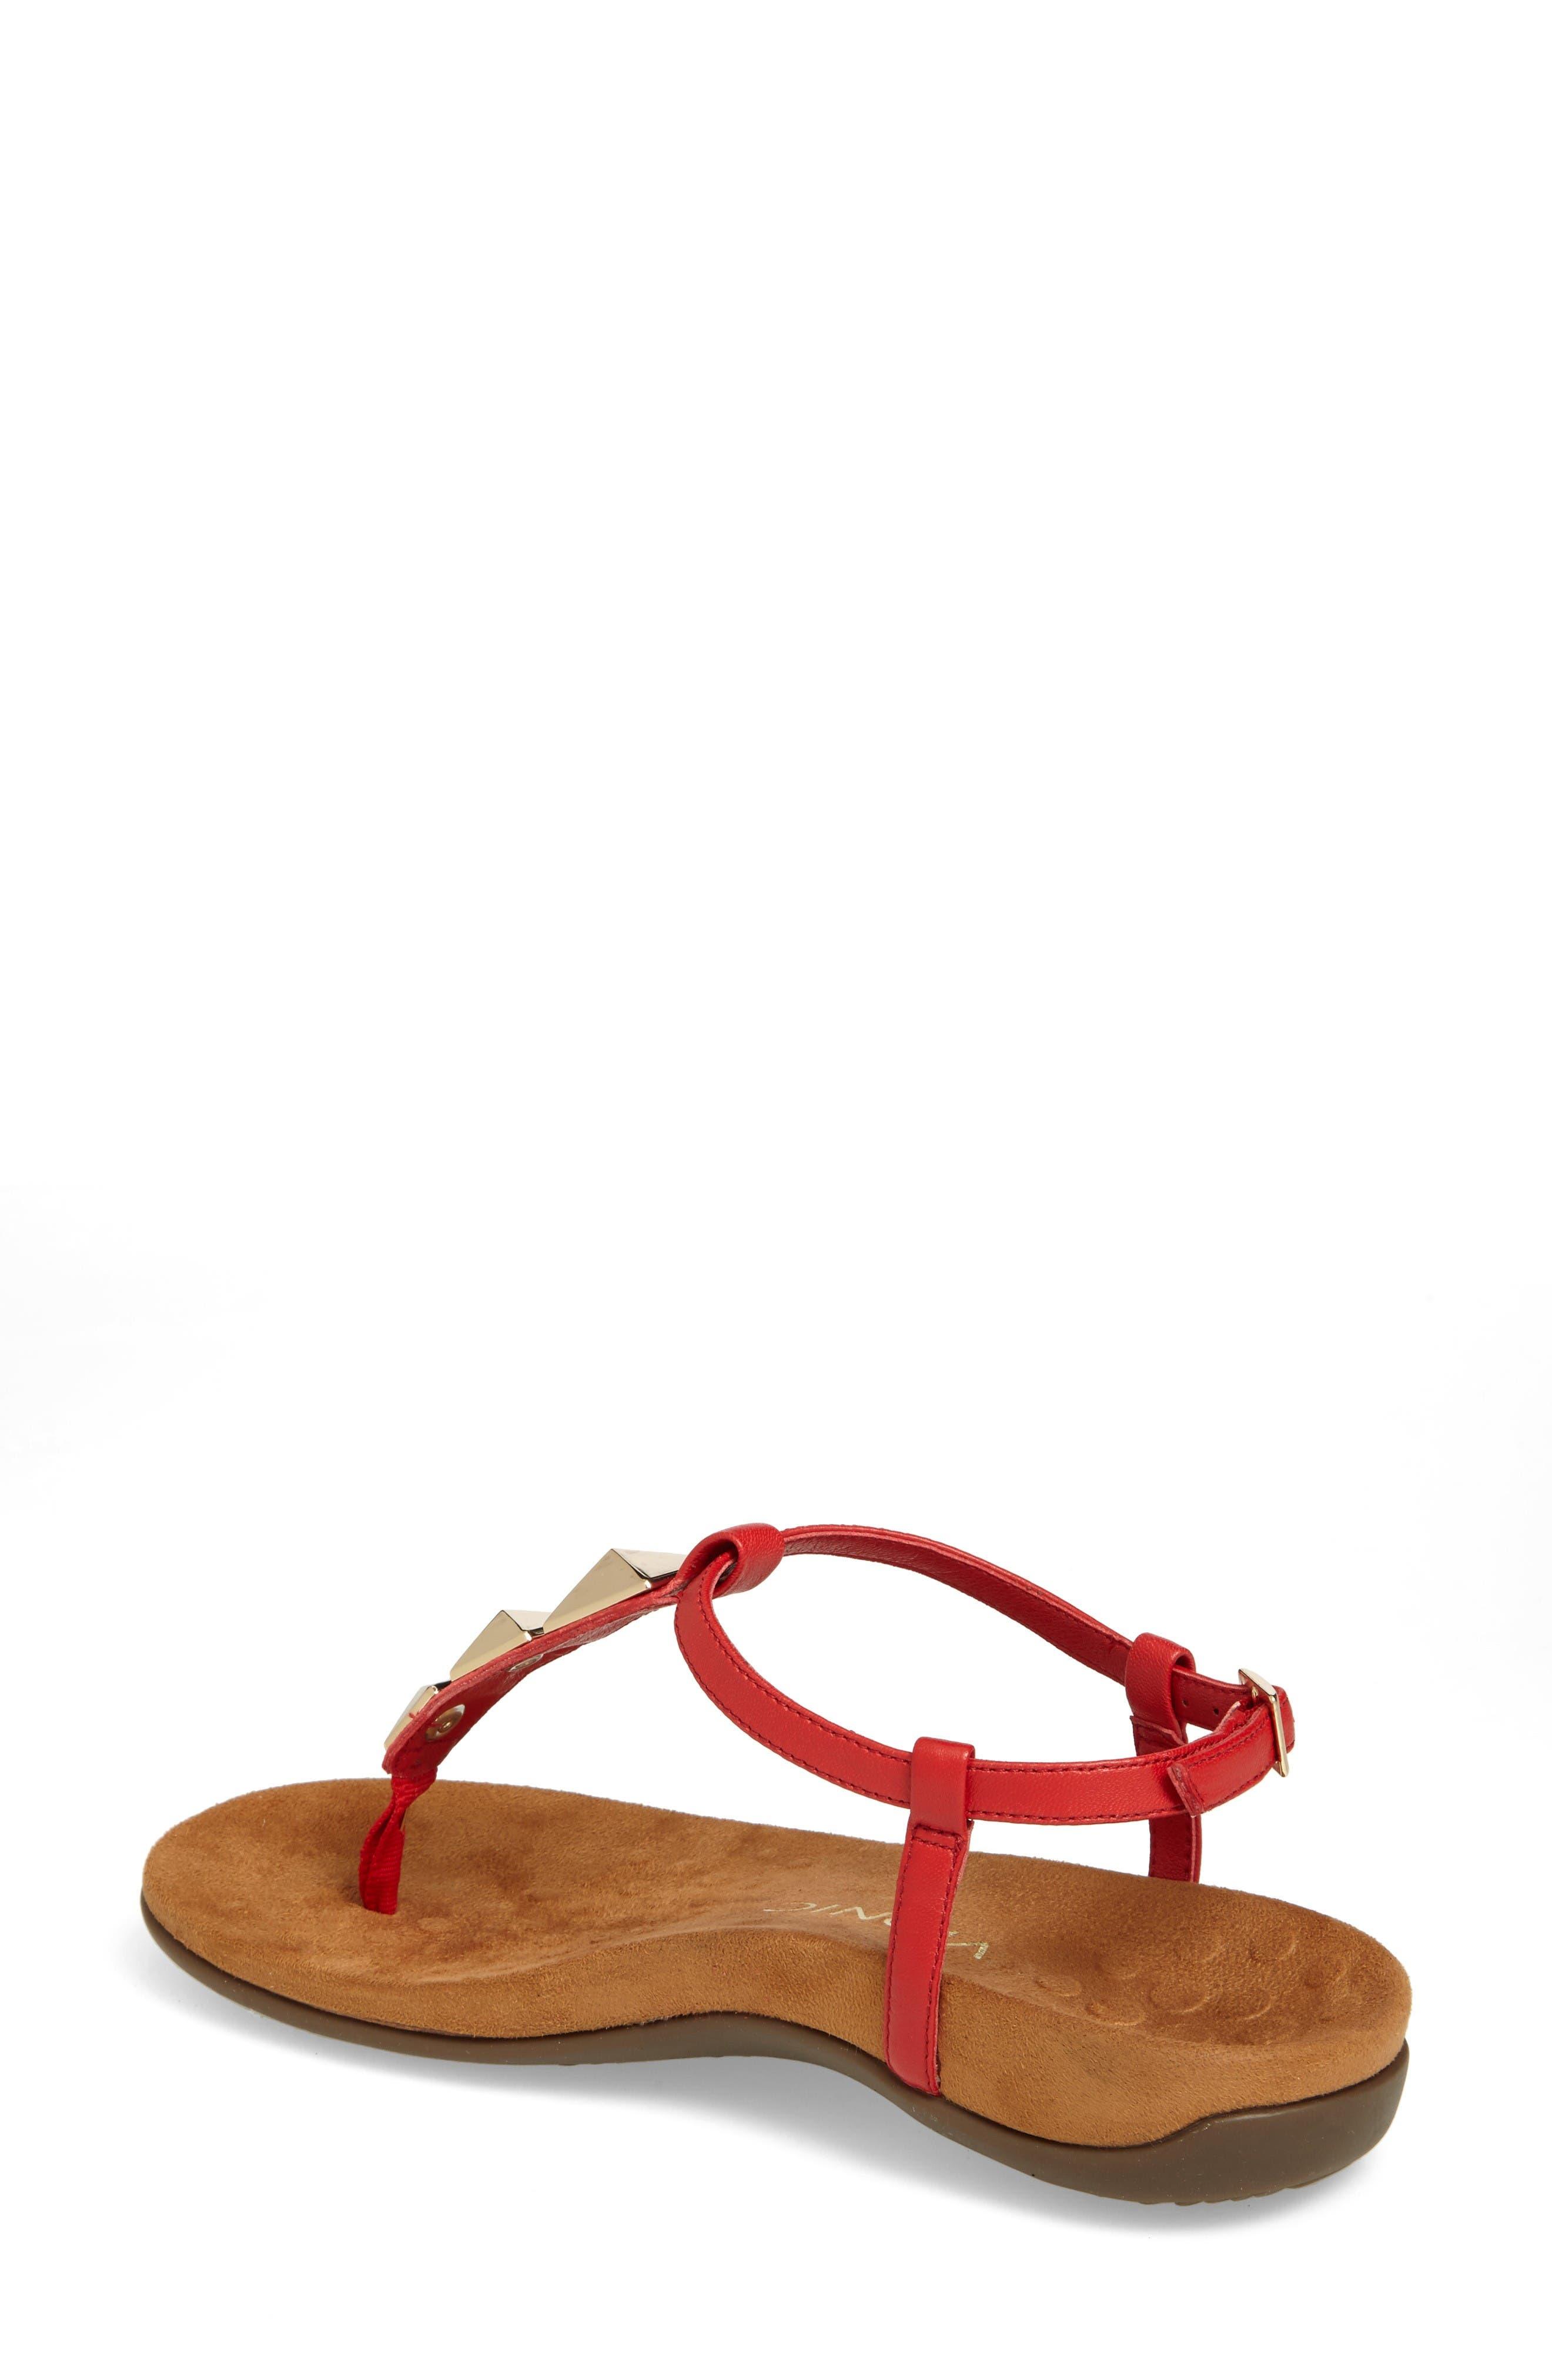 Alternate Image 2  - Vionic Nala T-Strap Sandal (Women)